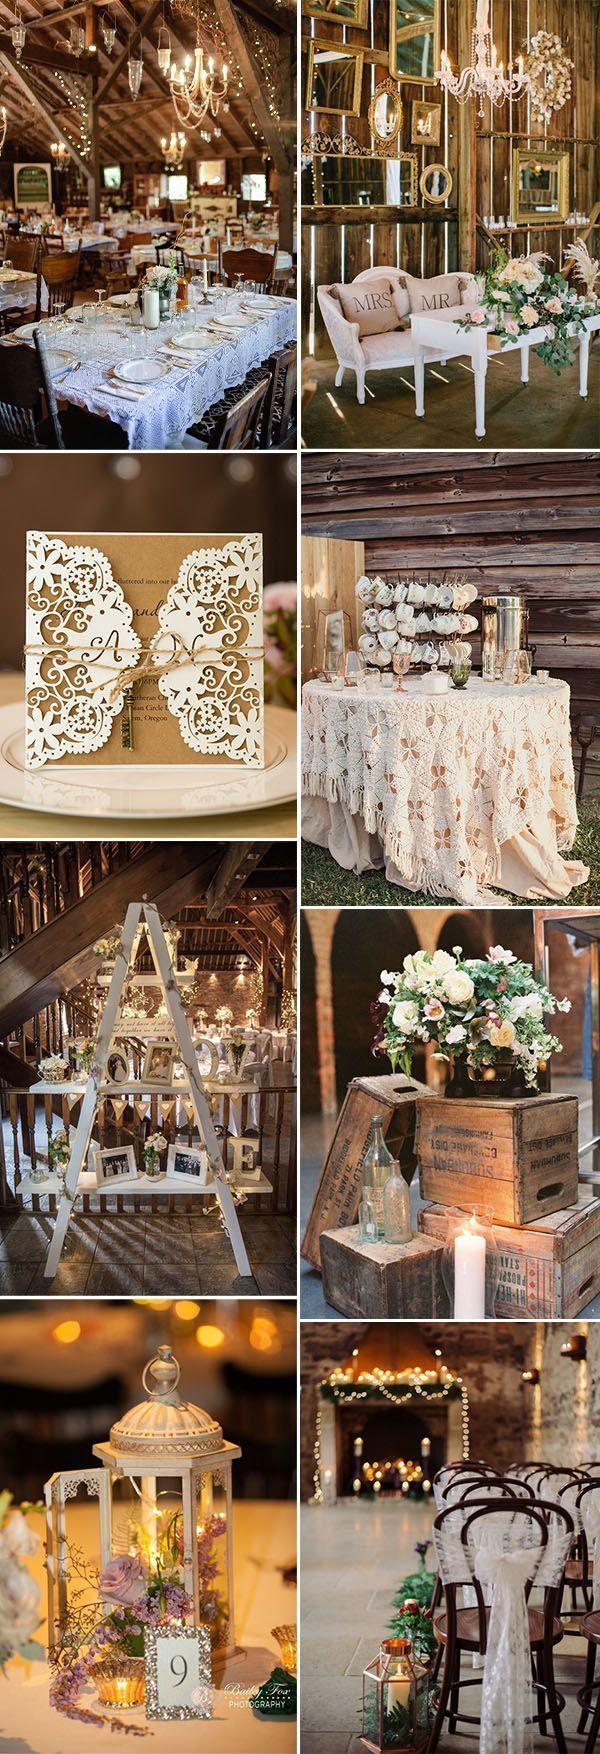 6 Awesome Vintage Wedding Theme Ideas To Inspire You Elegantweddinginvites Com Blog Vintage Barn Wedding Vintage Wedding Theme Classic Wedding Decorations